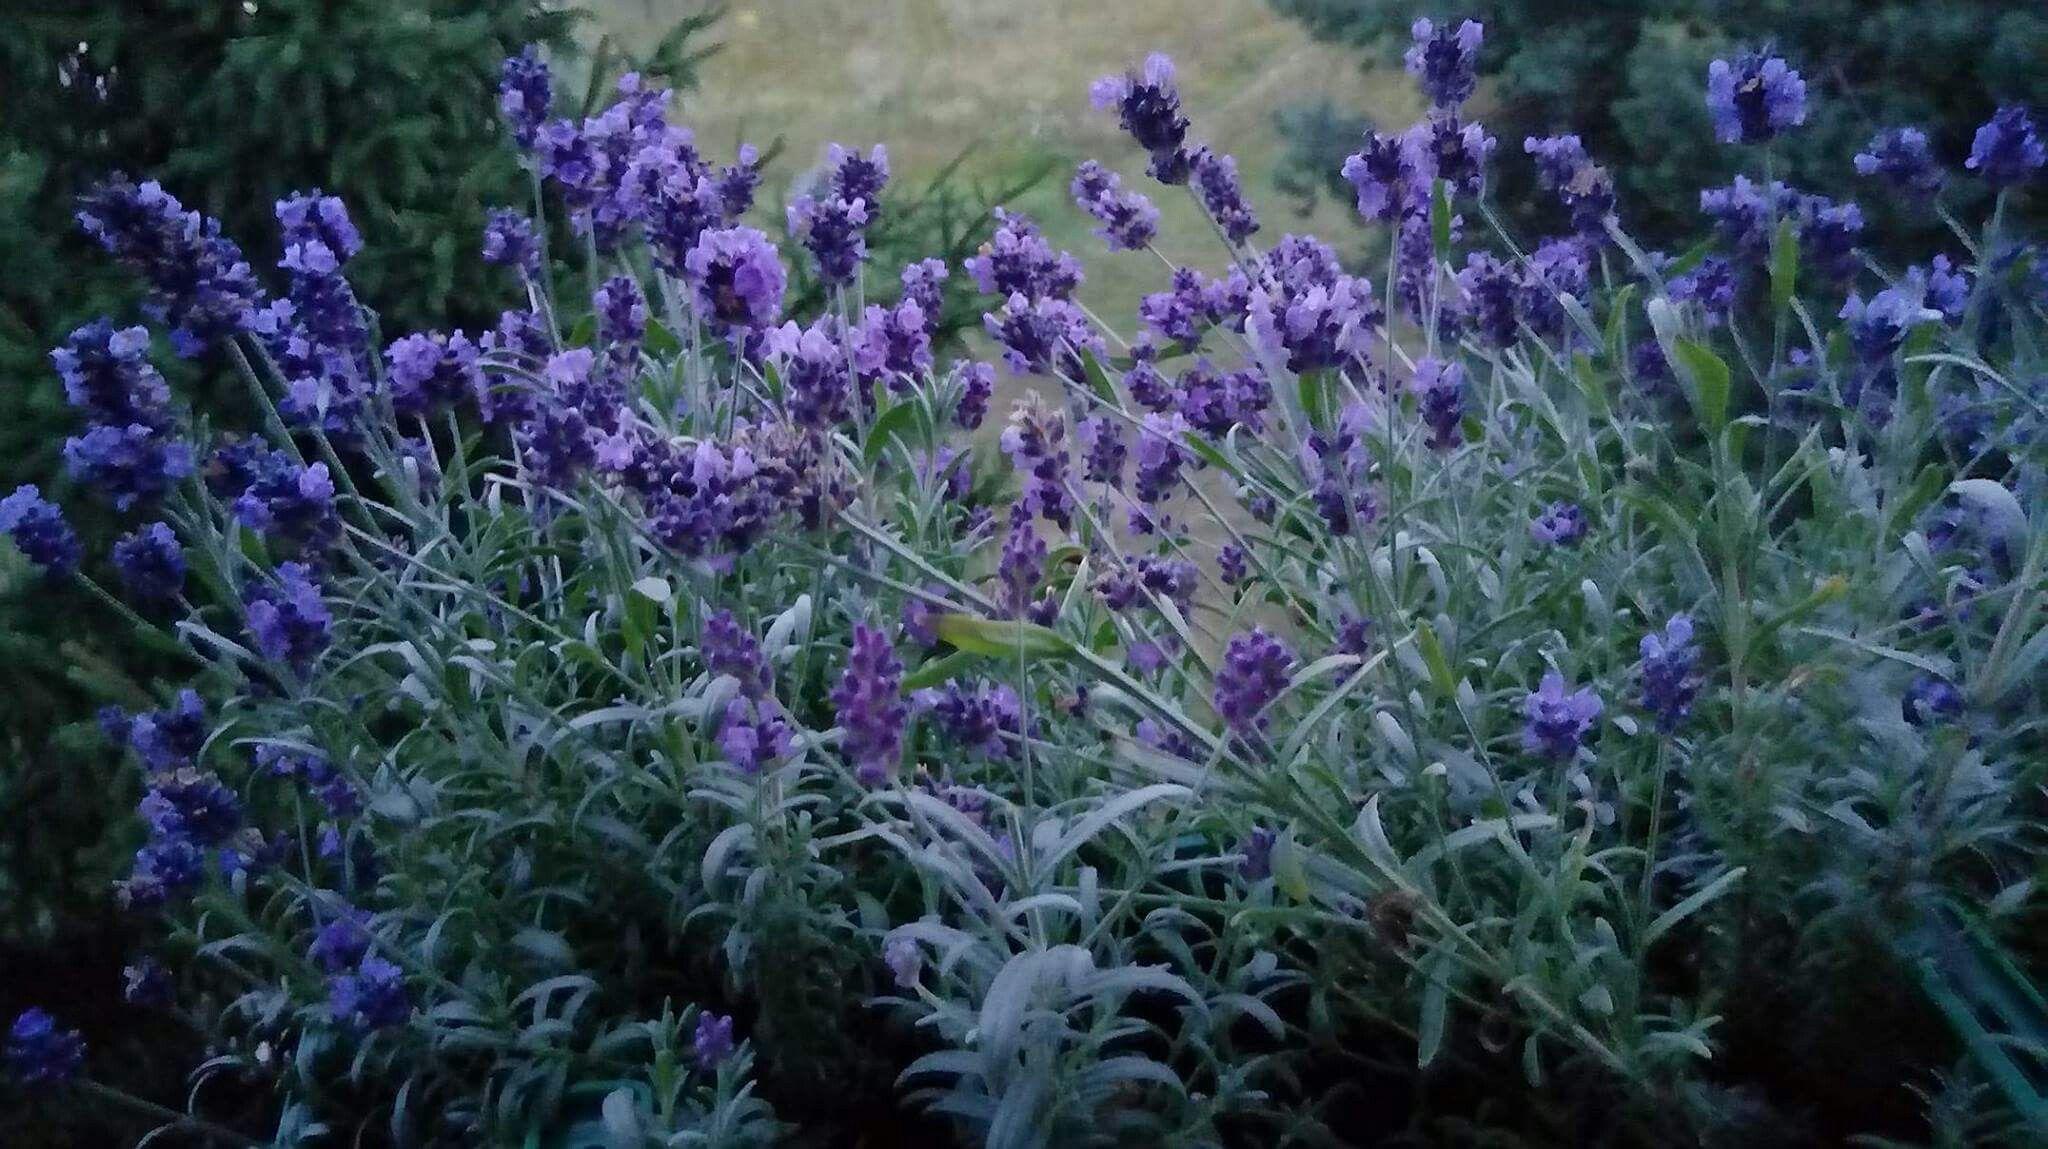 Lawenda Na Balkonie Plants